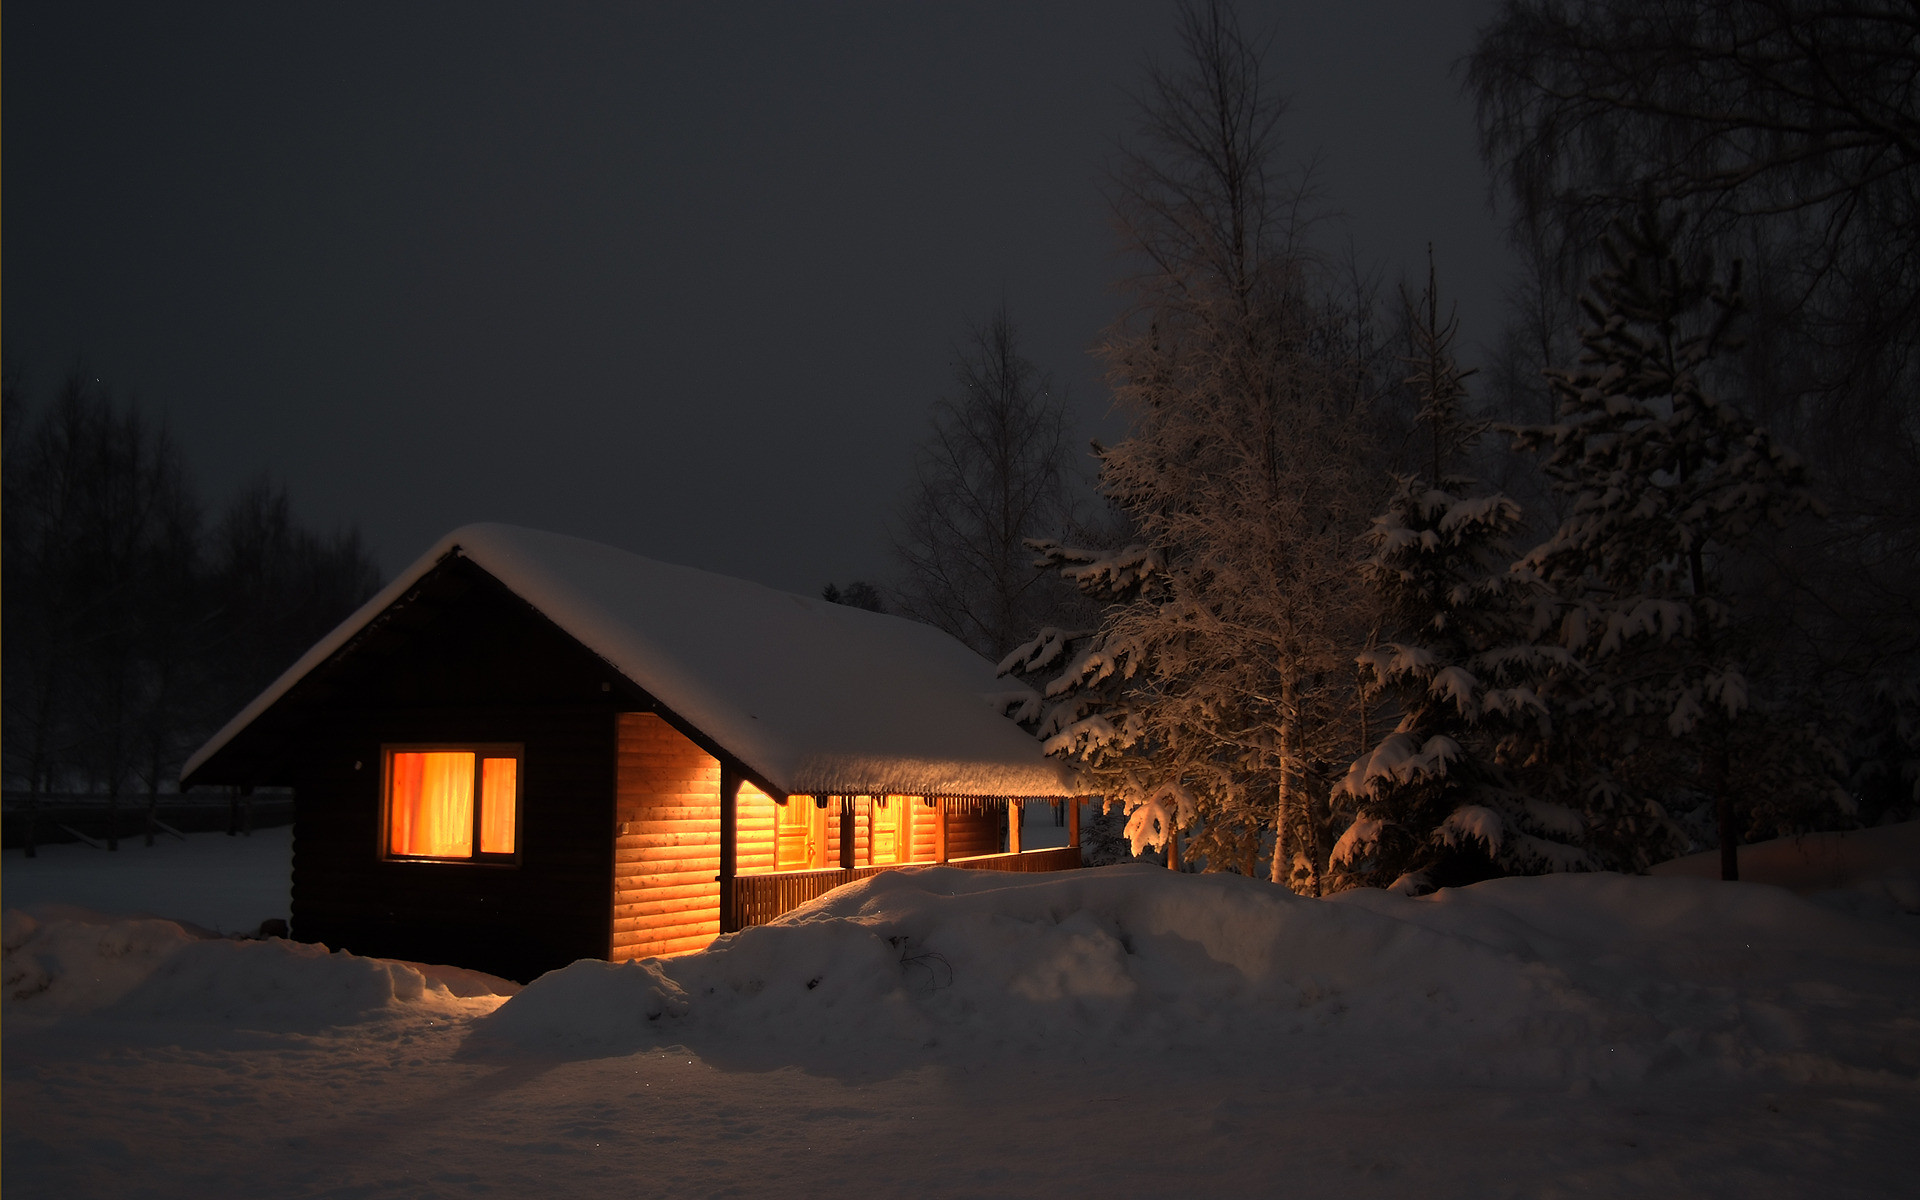 1920x1080 Title. Polar lights over the log cabin